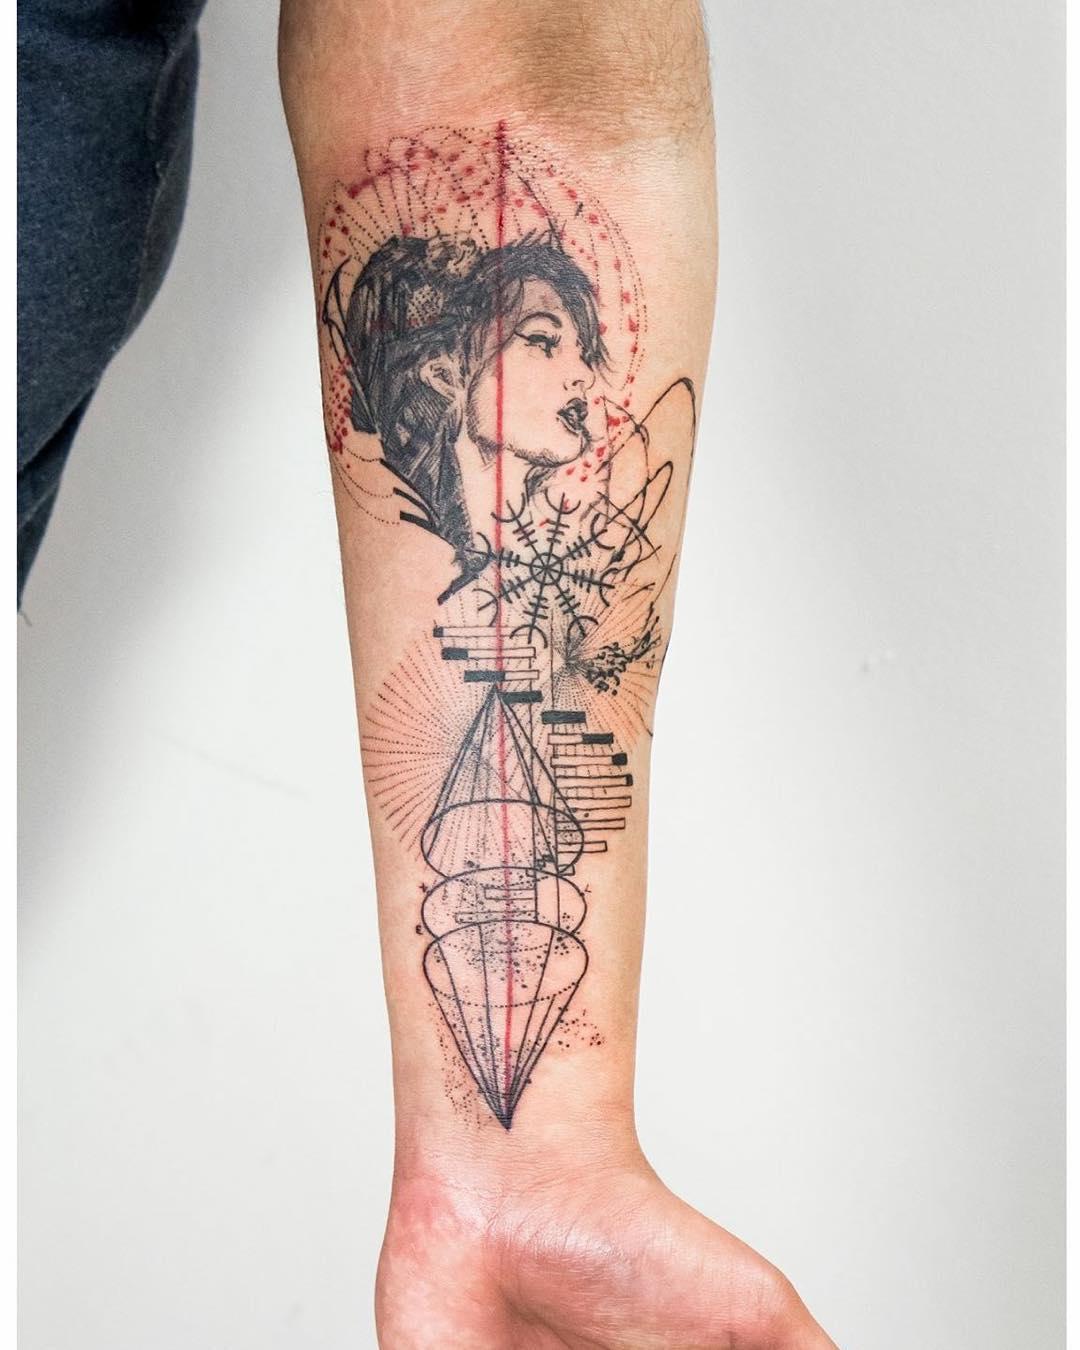 Prosperities Tattoo on Arm